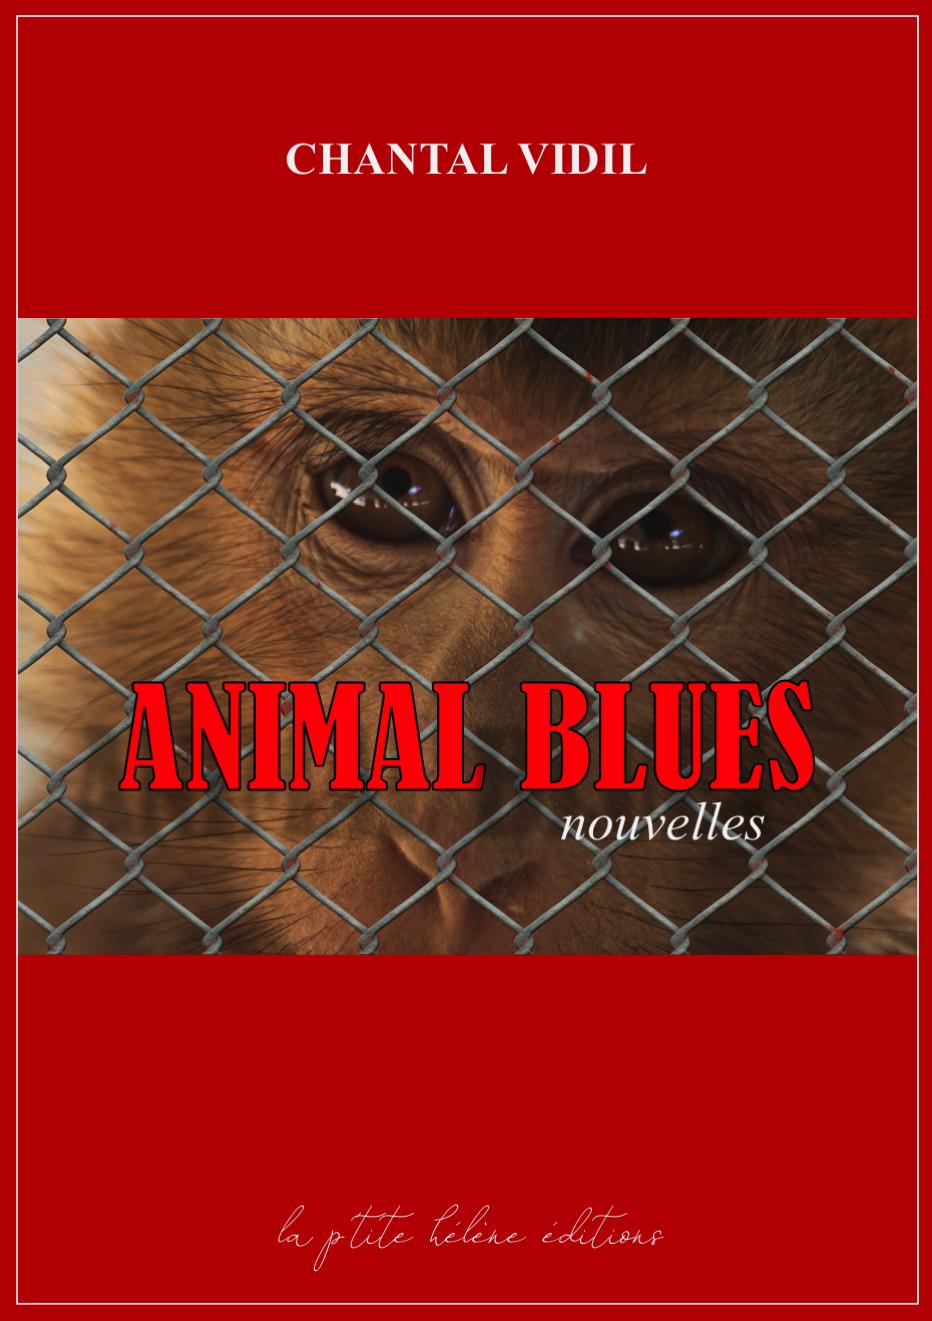 Animal blues